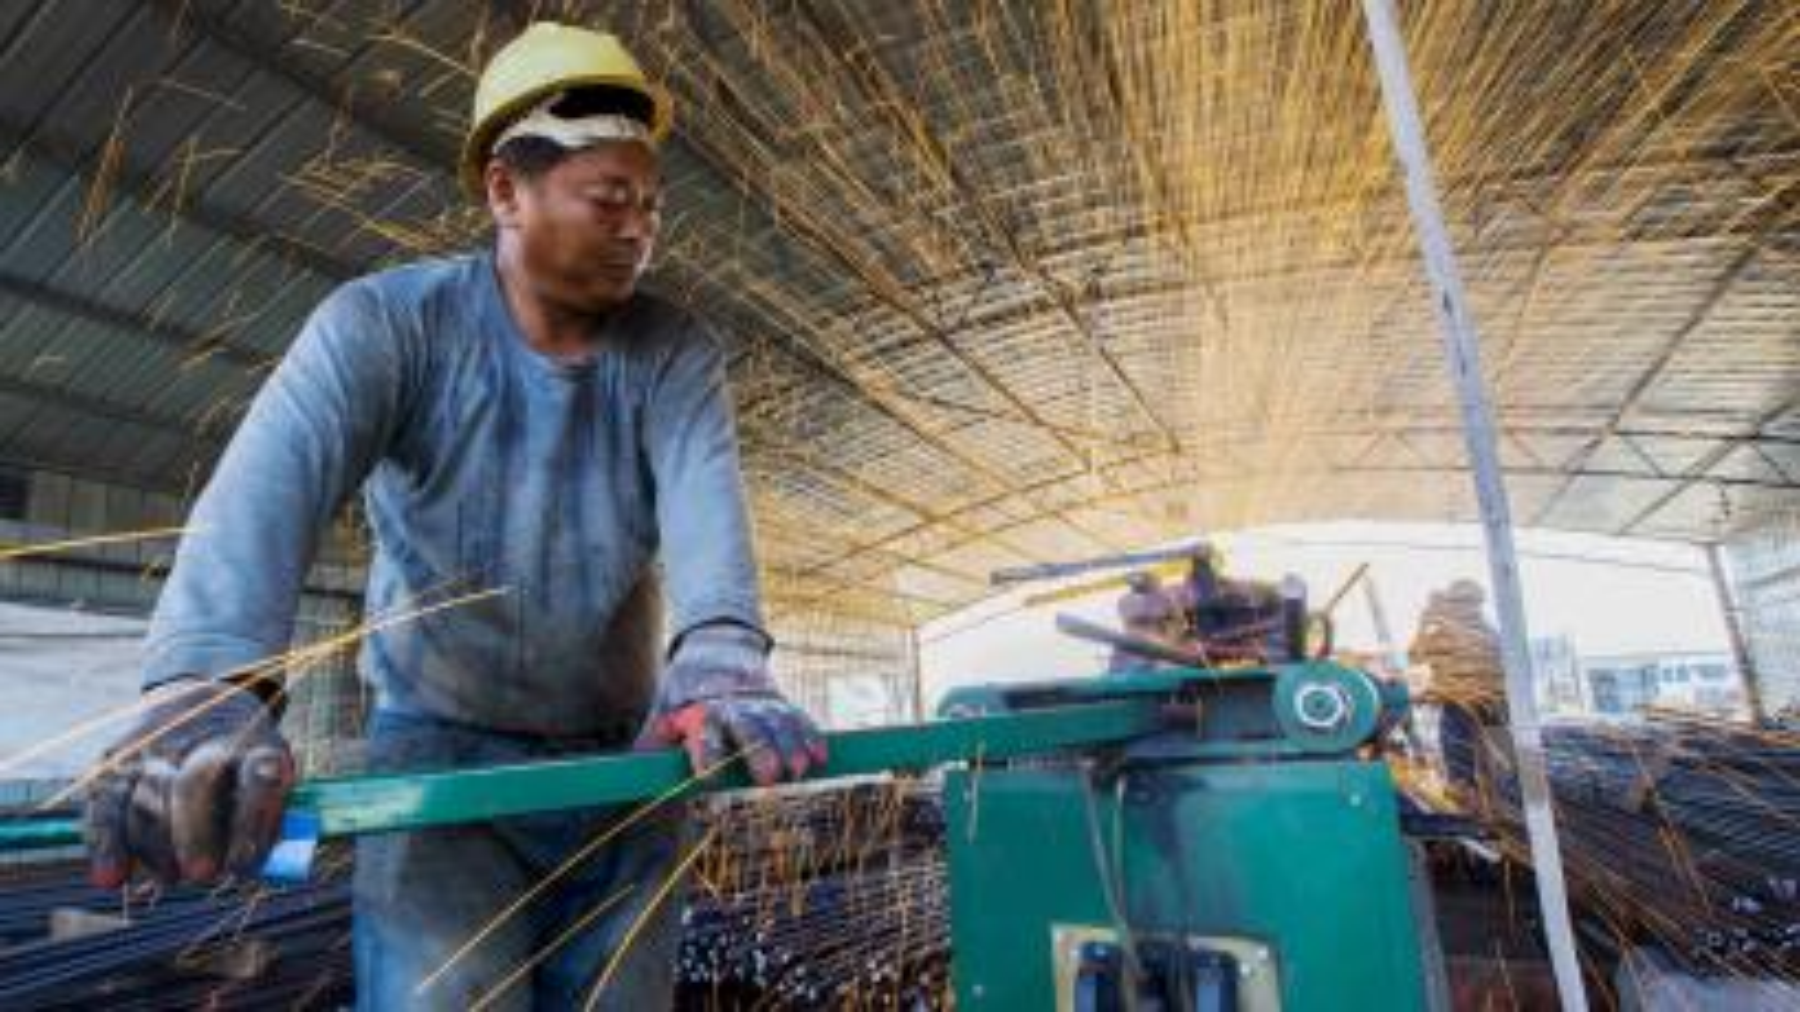 A worker cuts steel bars at a railway bridge construction site in Lianyungang, Jiangsu province.